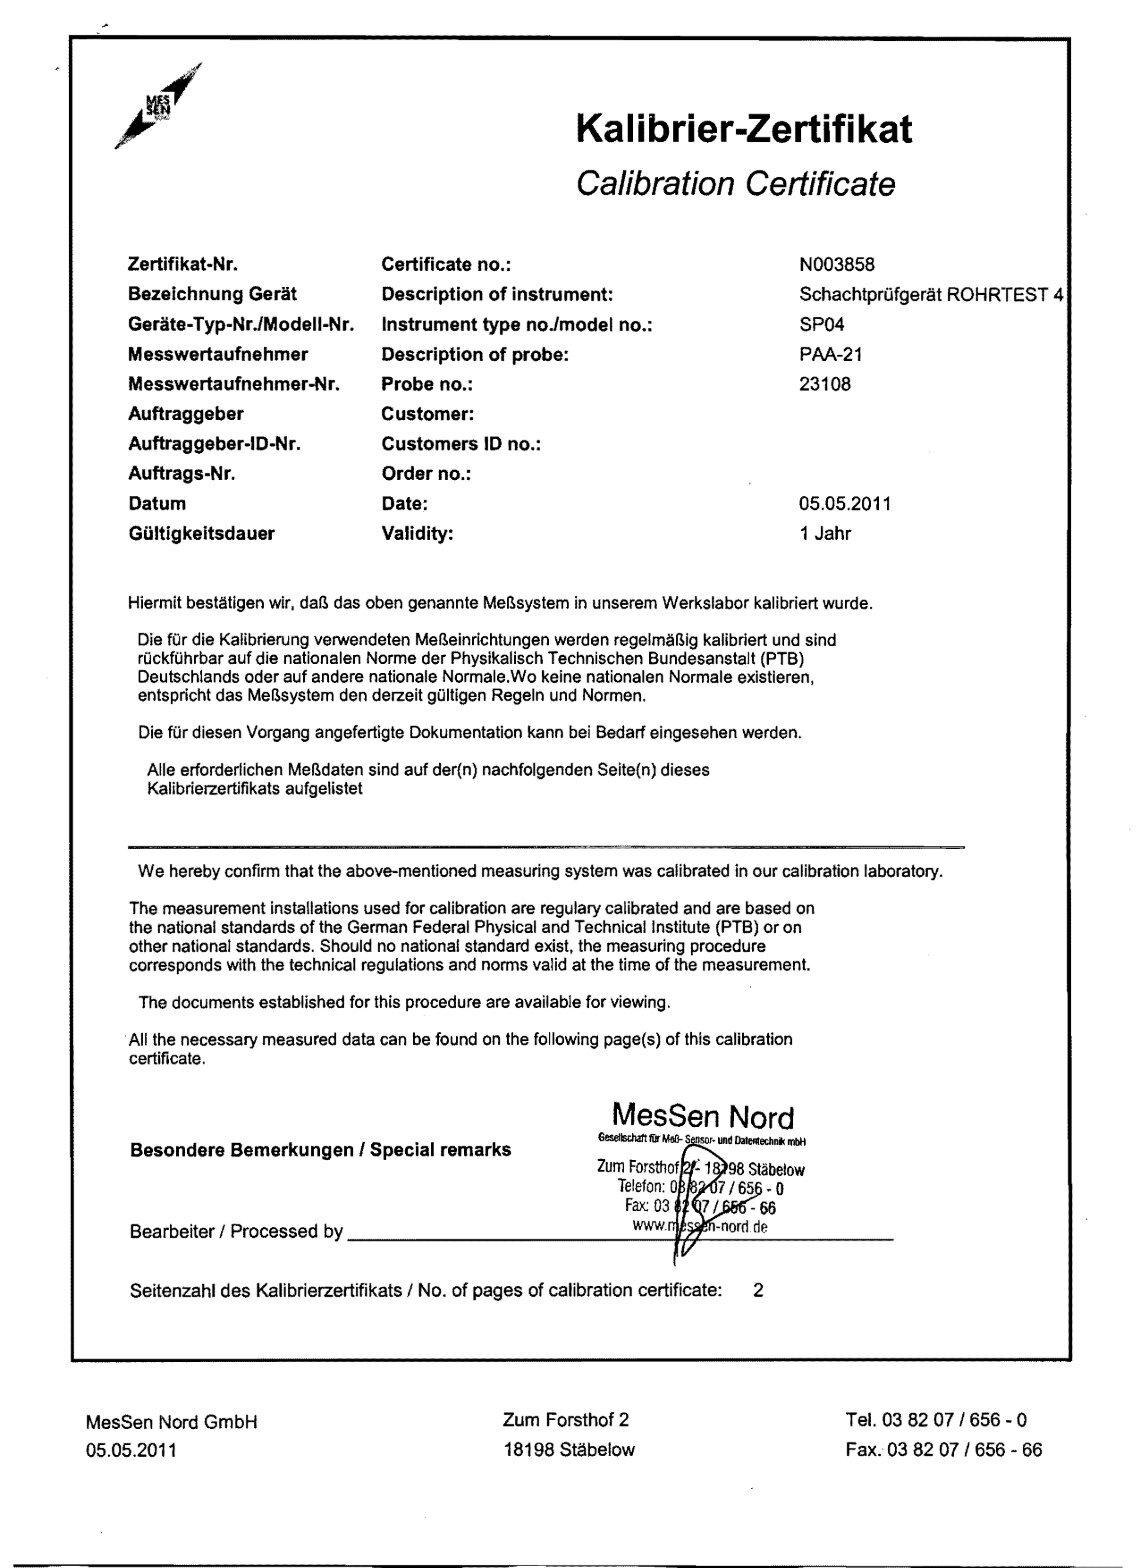 Atemberaubend Lebenslauf Pdf Proben Ideen - Entry Level Resume ...